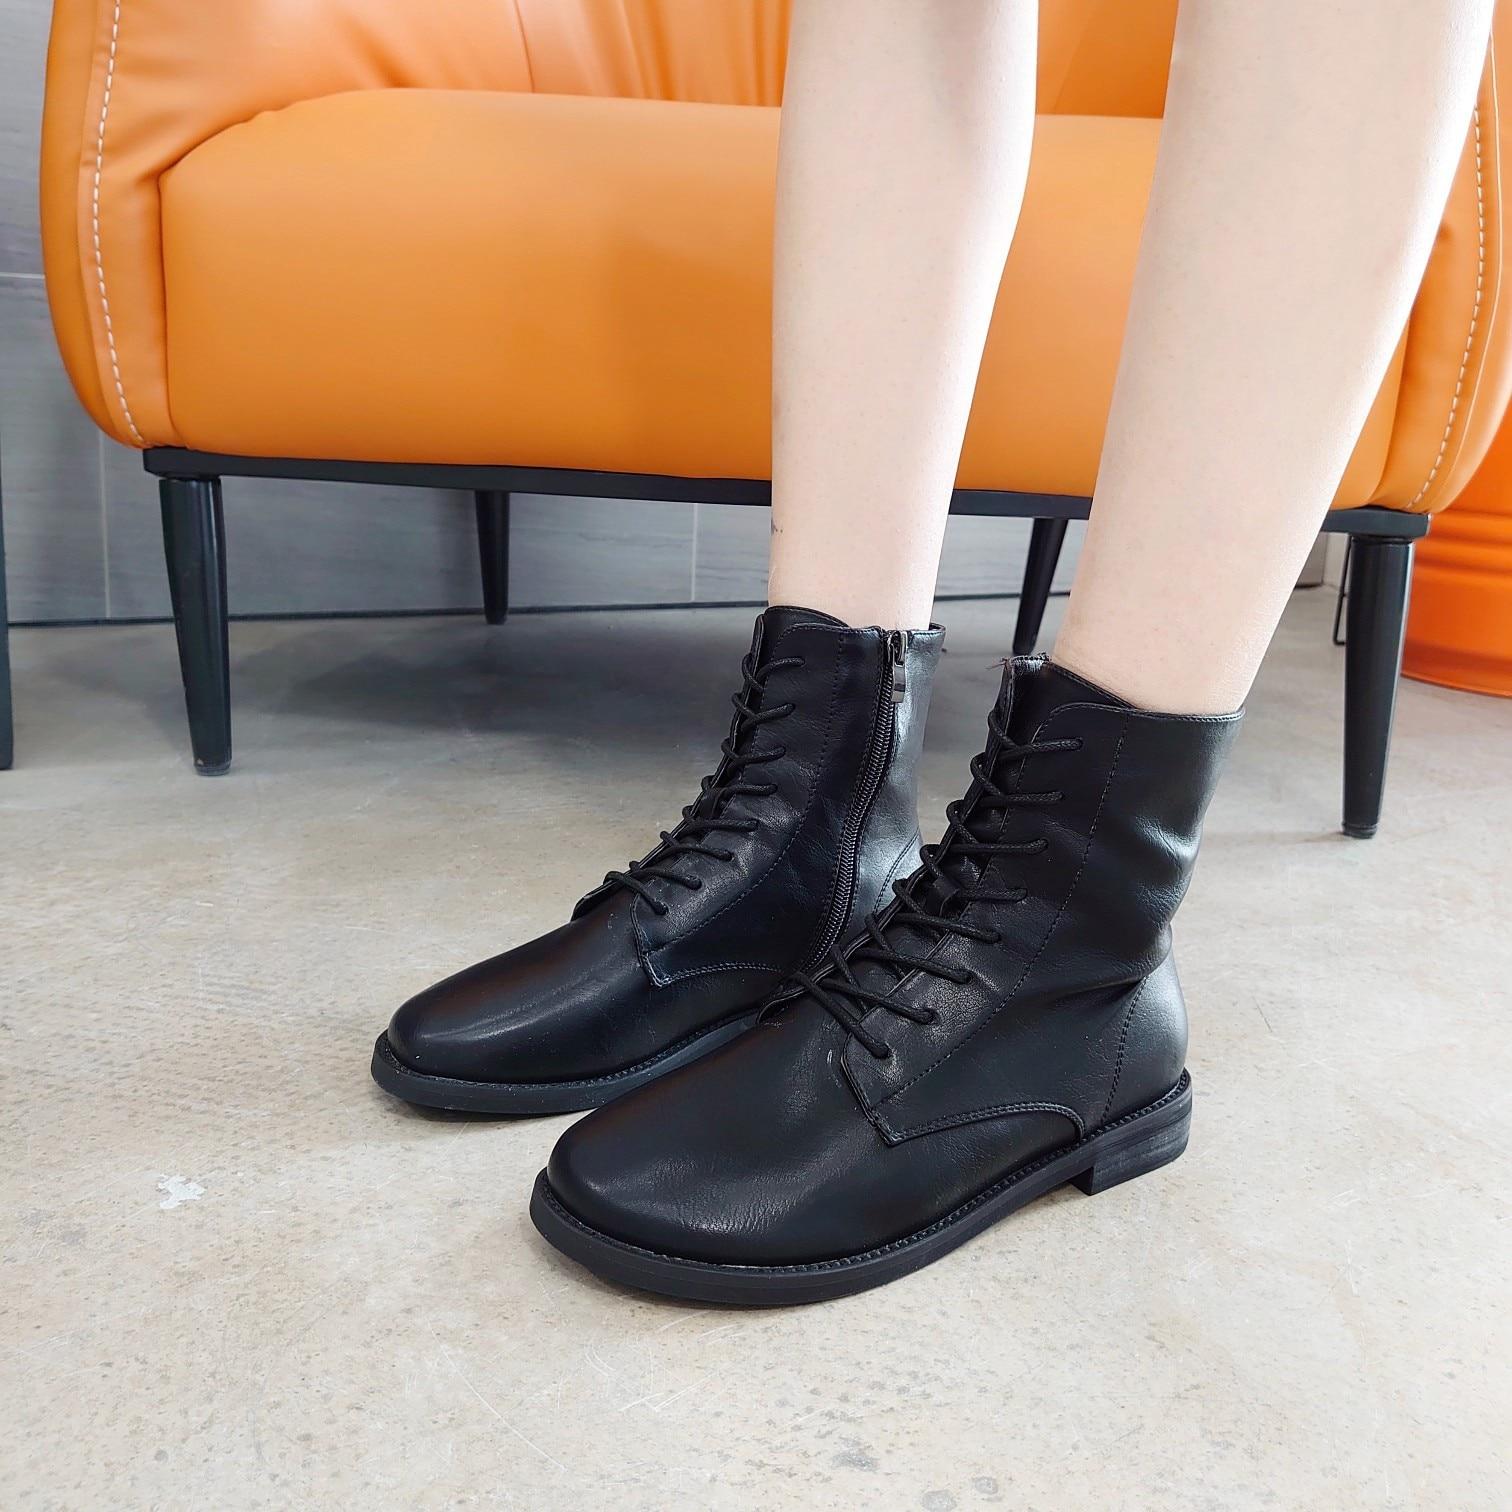 Martin Boots Children 2019 Autumn New Style British-Style Thin Cashmere Trendy Shoes Online Celebrity Versatile Single Boots Aut